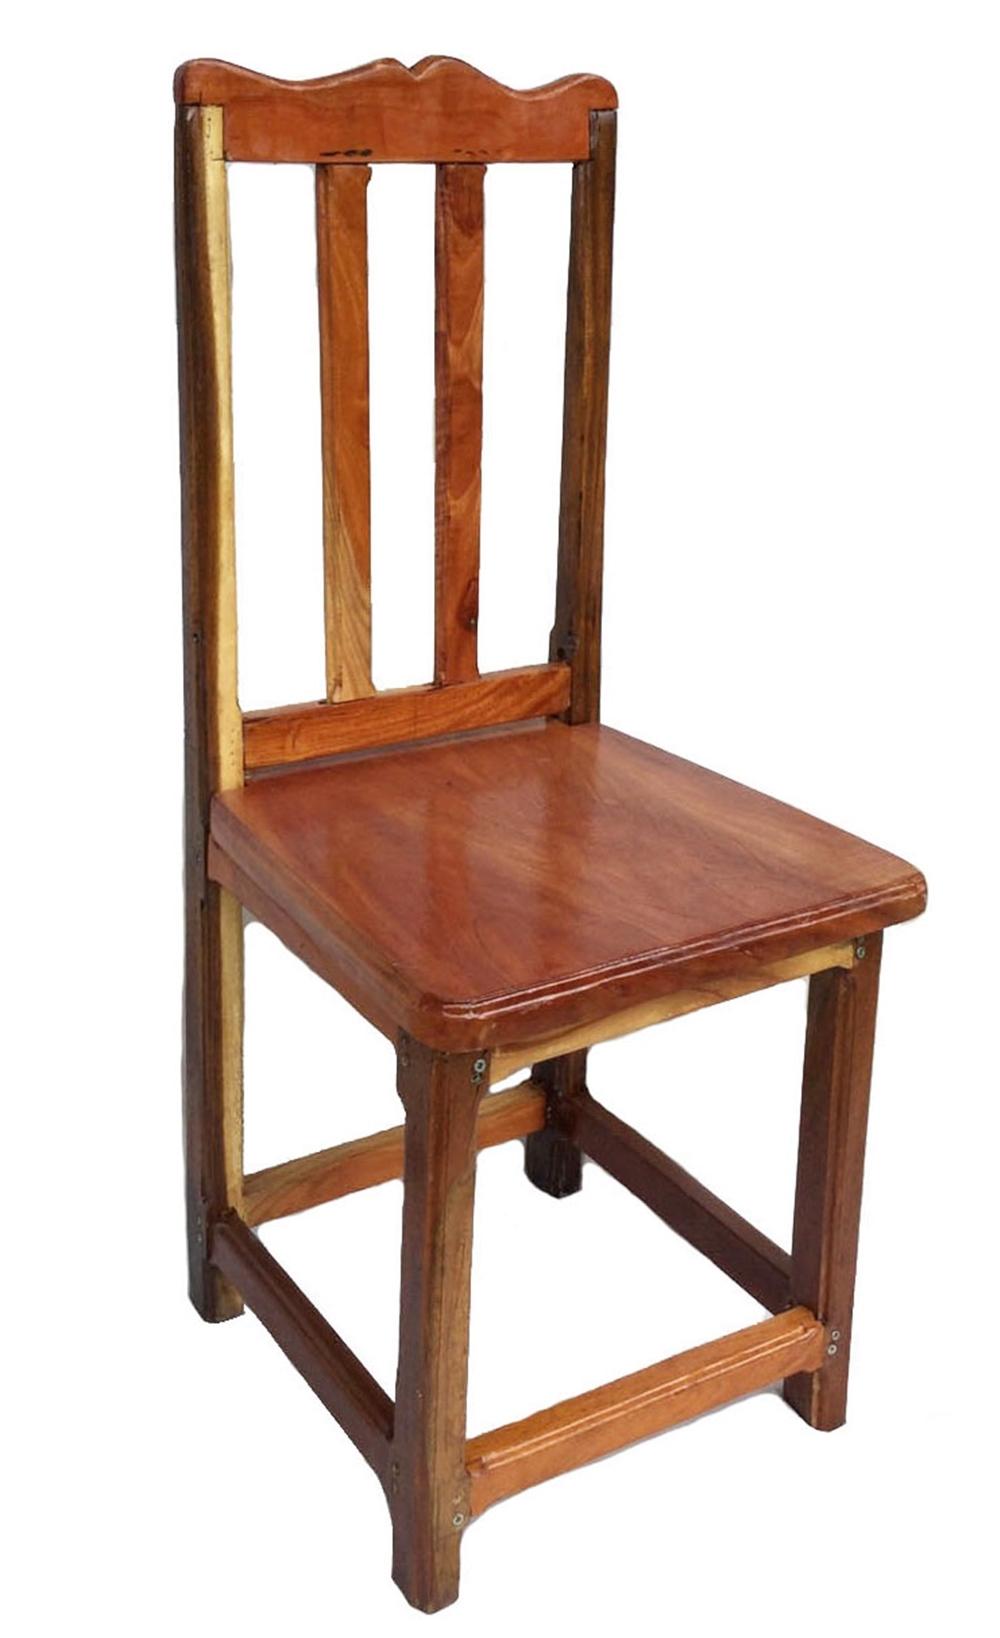 K'DAUZ เก้าอี้ไม้